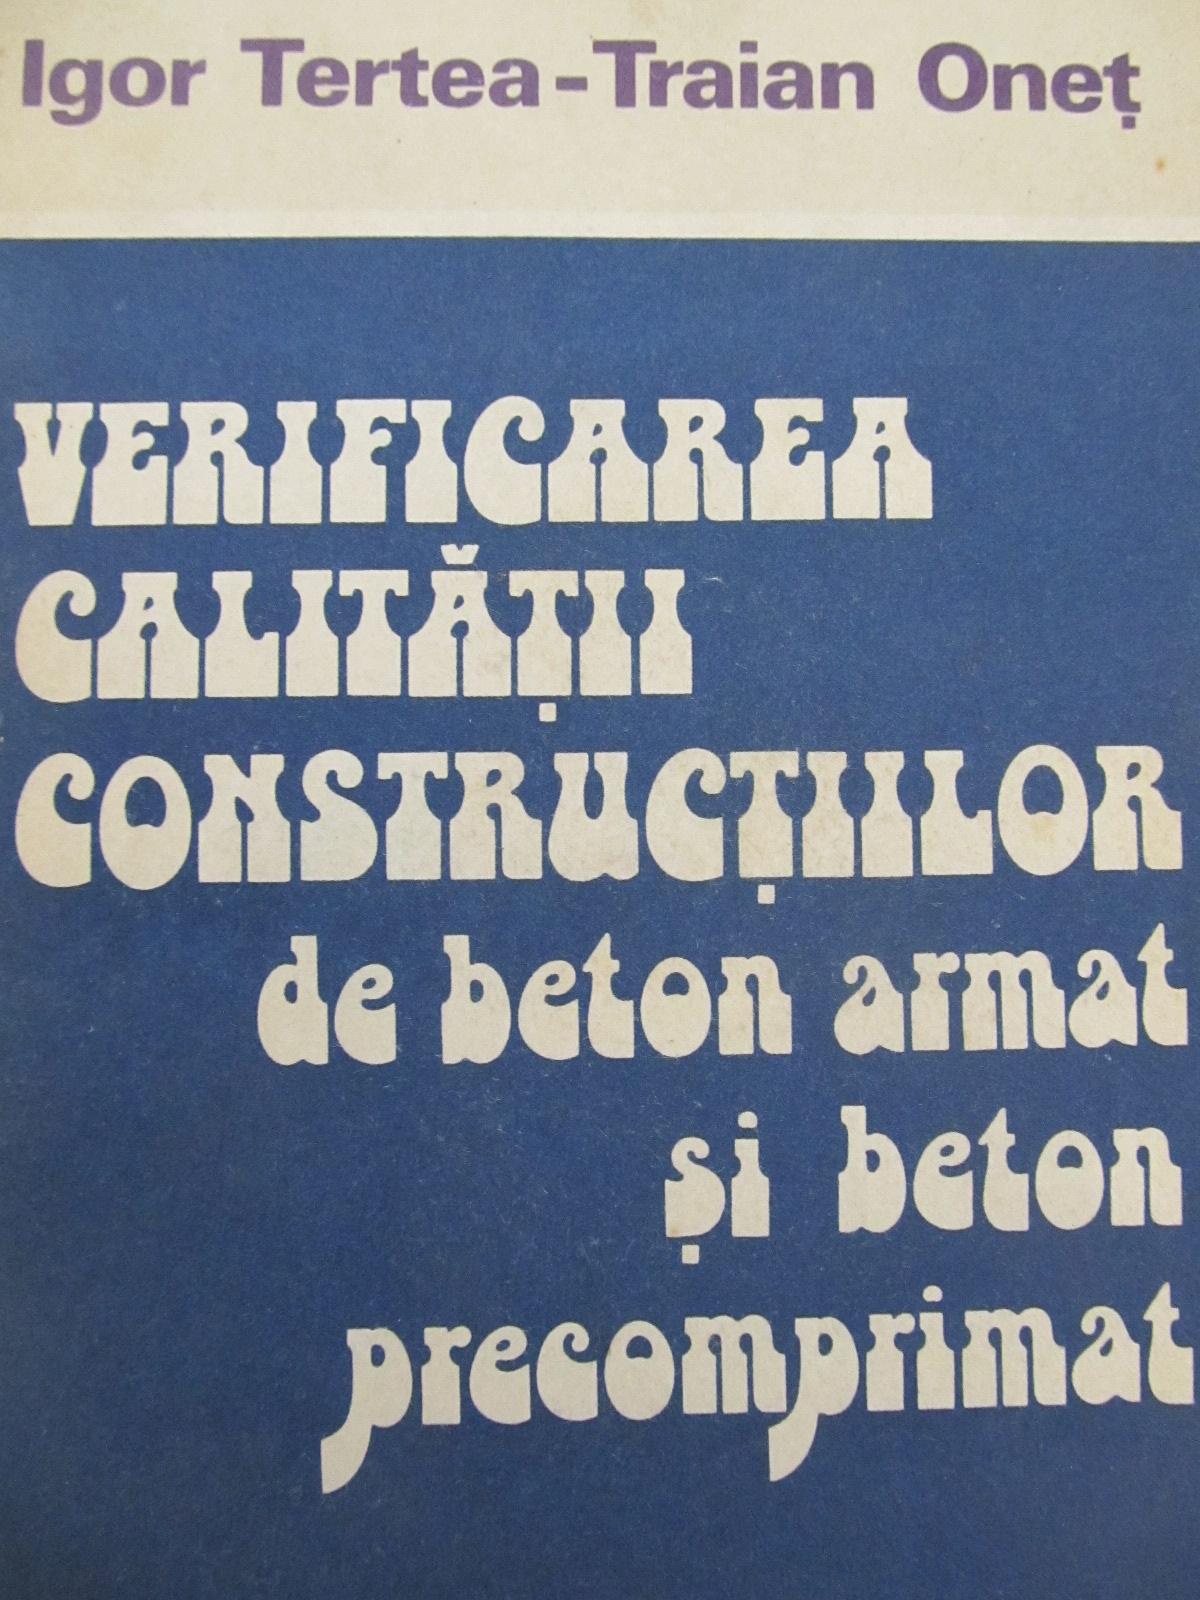 Verificarea calitatii constructiilor de beton armat si beton precomprimat [1] - Igor Tertea , Traian Onet | Detalii carte